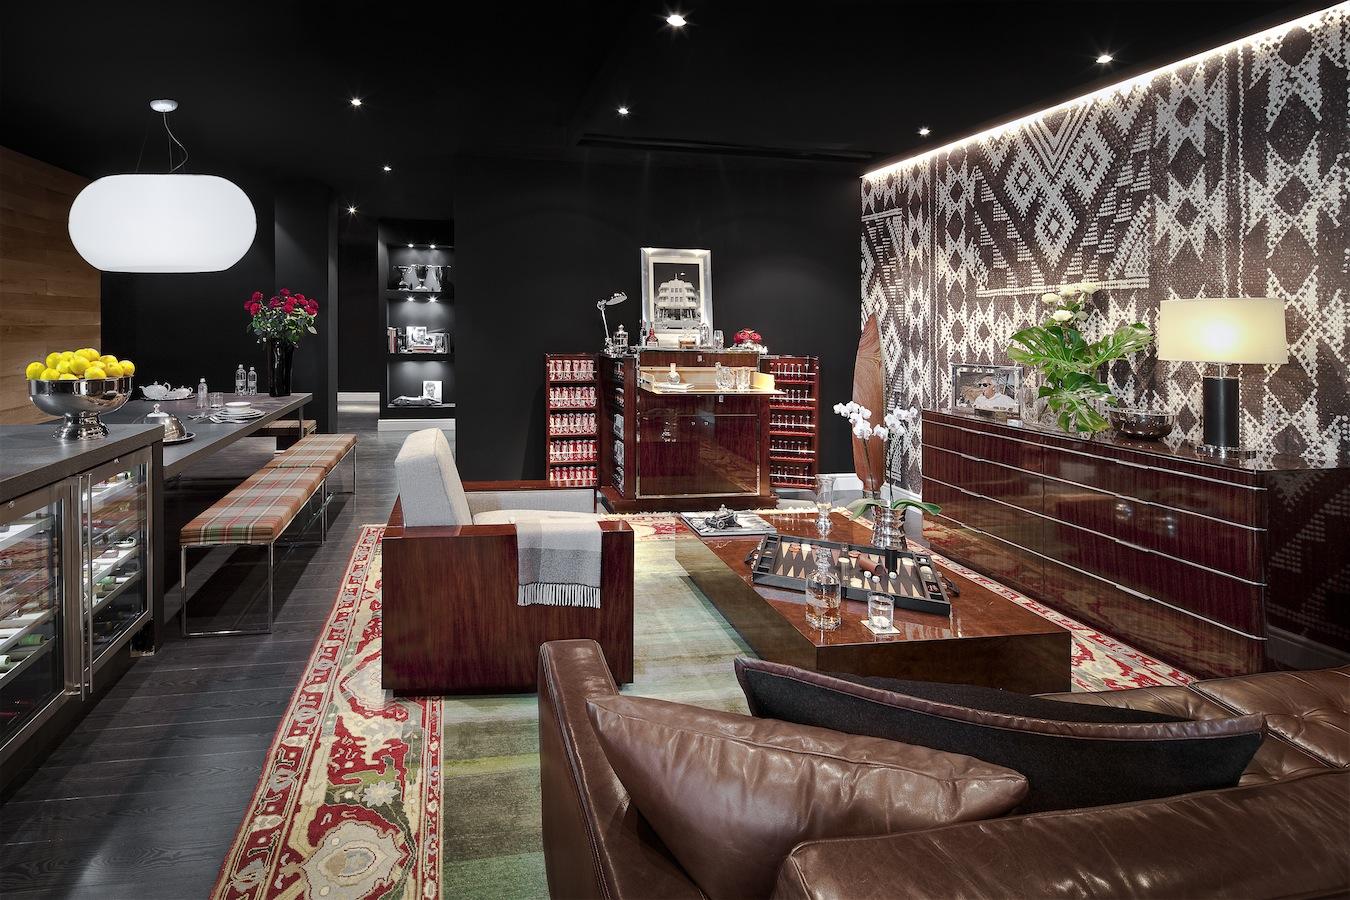 iSaloni 2017 iSaloni 2017 - 5 лучших дизайн-отелей Милана 8 4